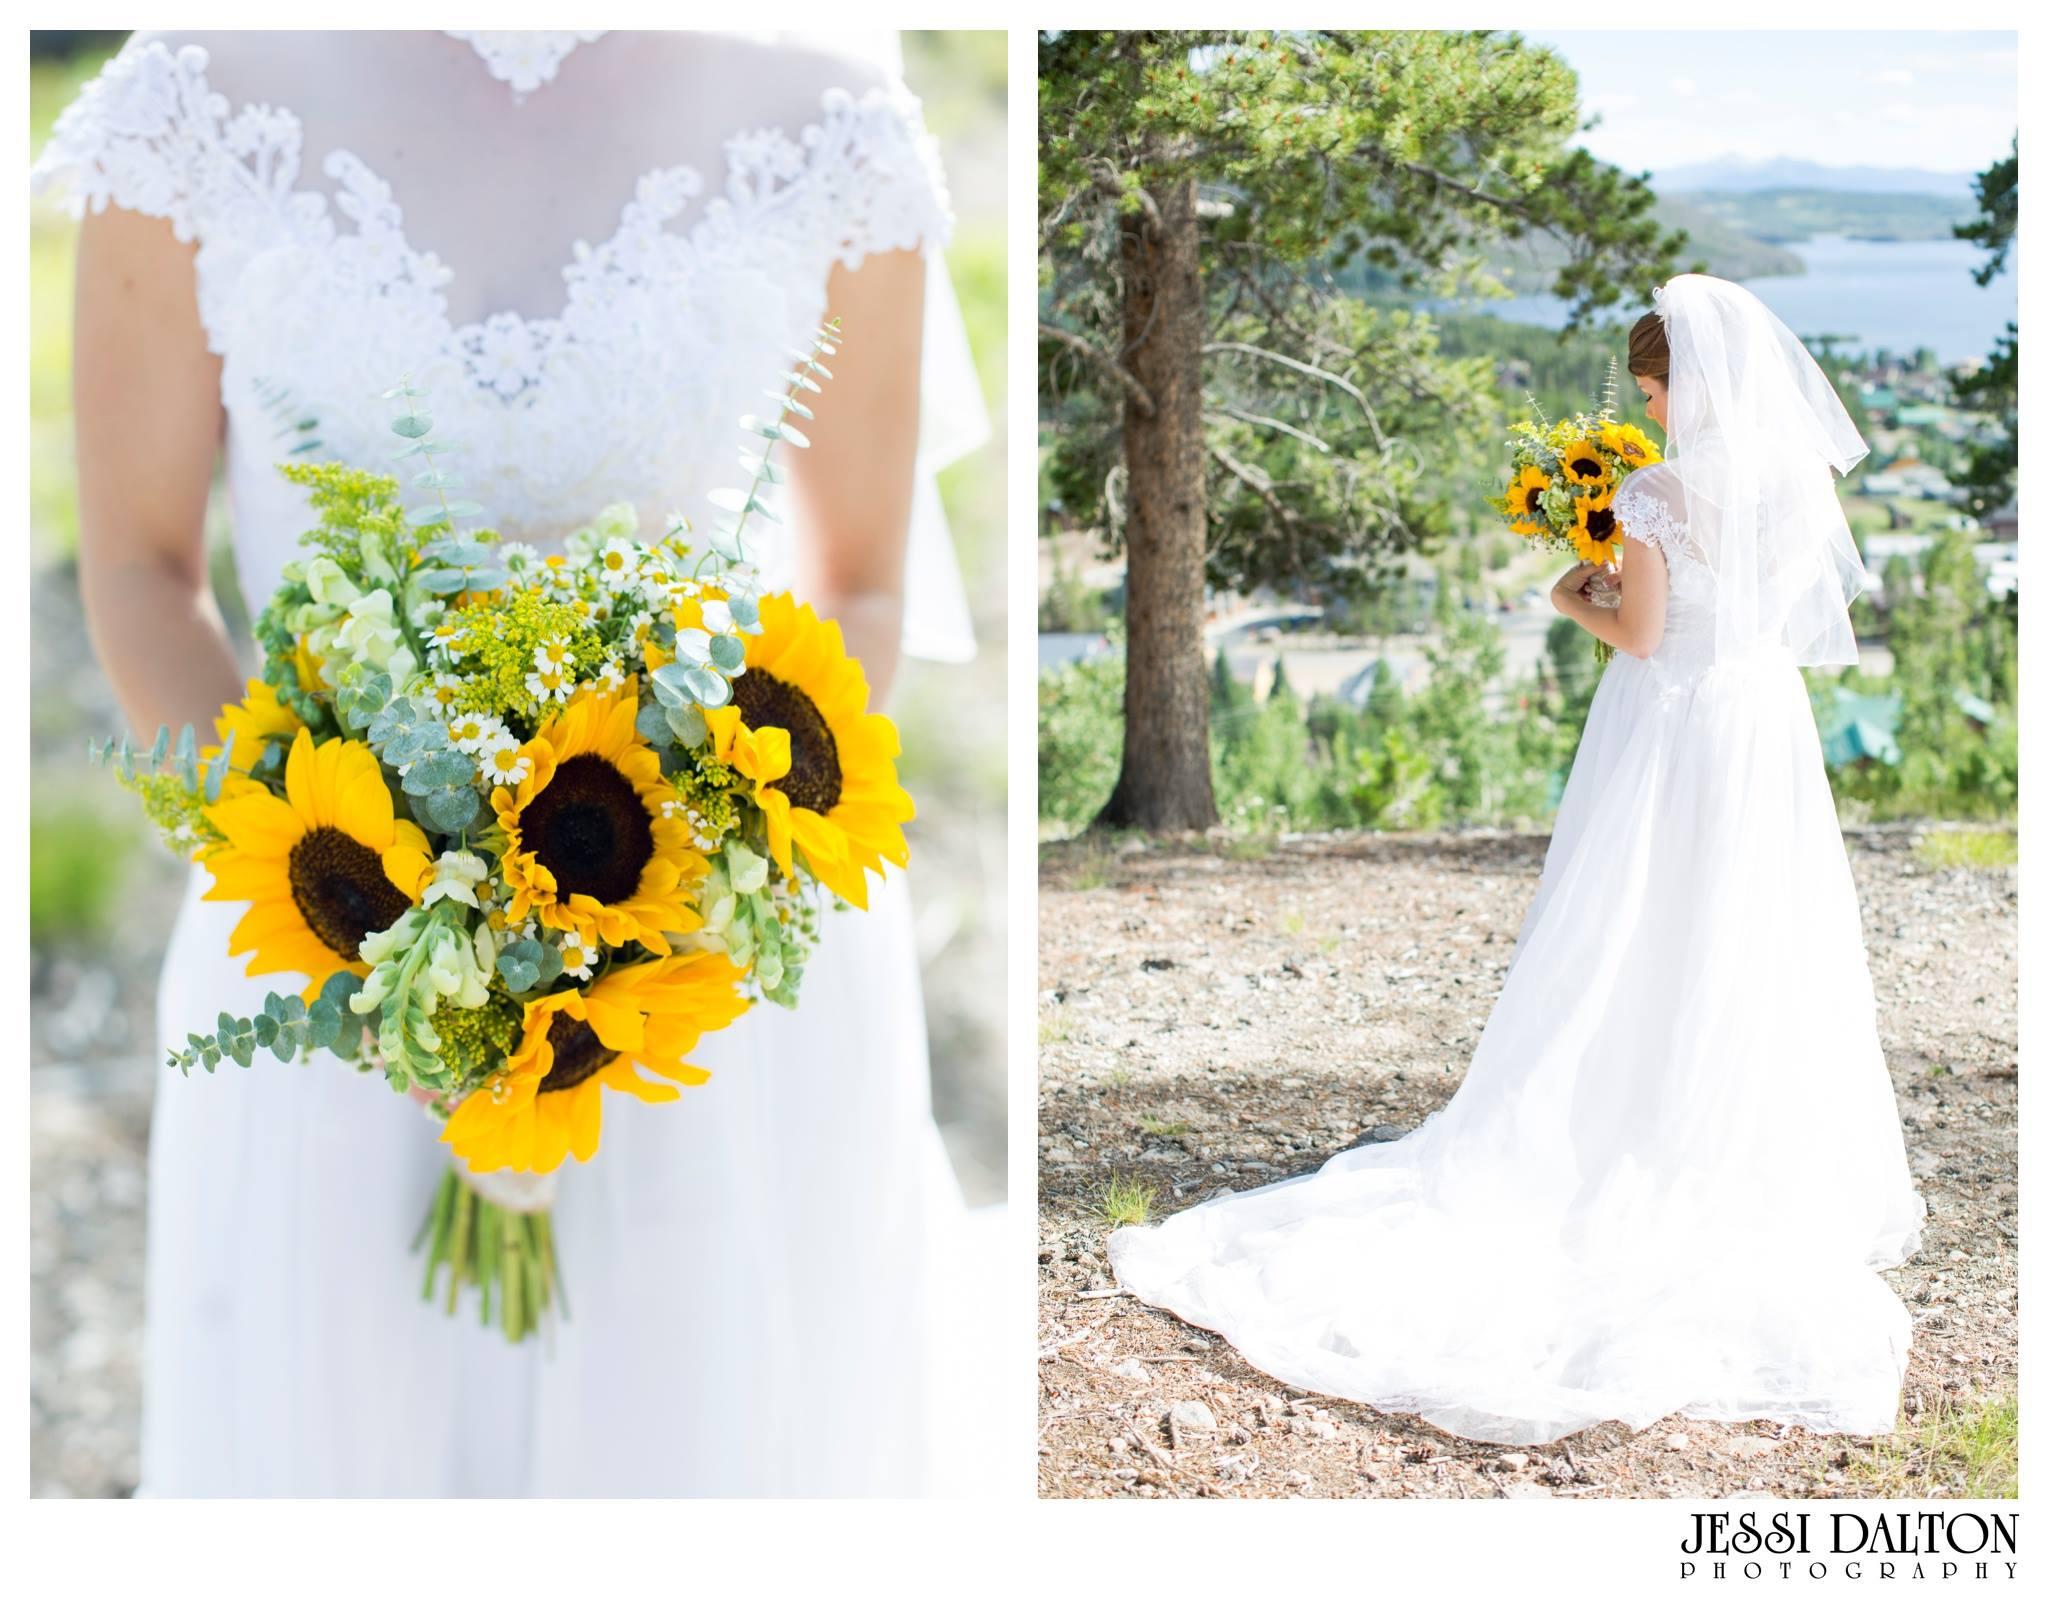 Grand Lake Lodge wedding. Photos by Jessi Dalton Photography. www.jessidalton.com